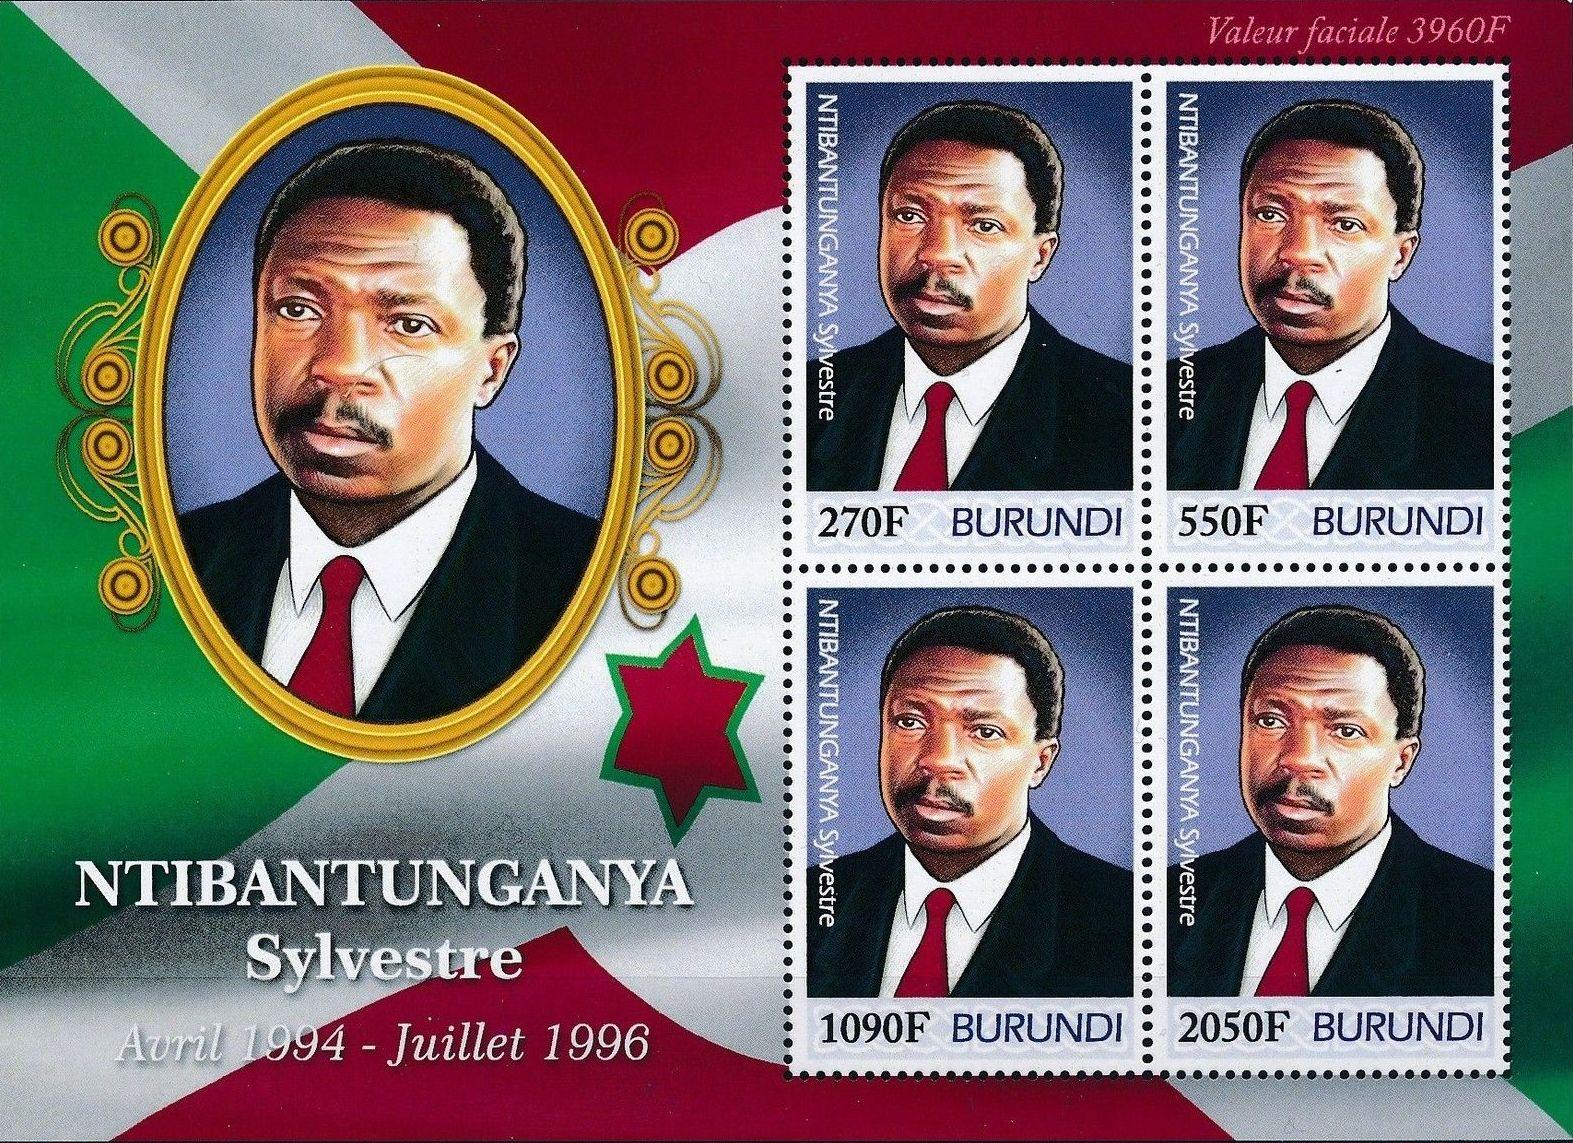 Burundi 2012 Presidents of Burundi - Sylvestre Ntibantunganya g.jpg